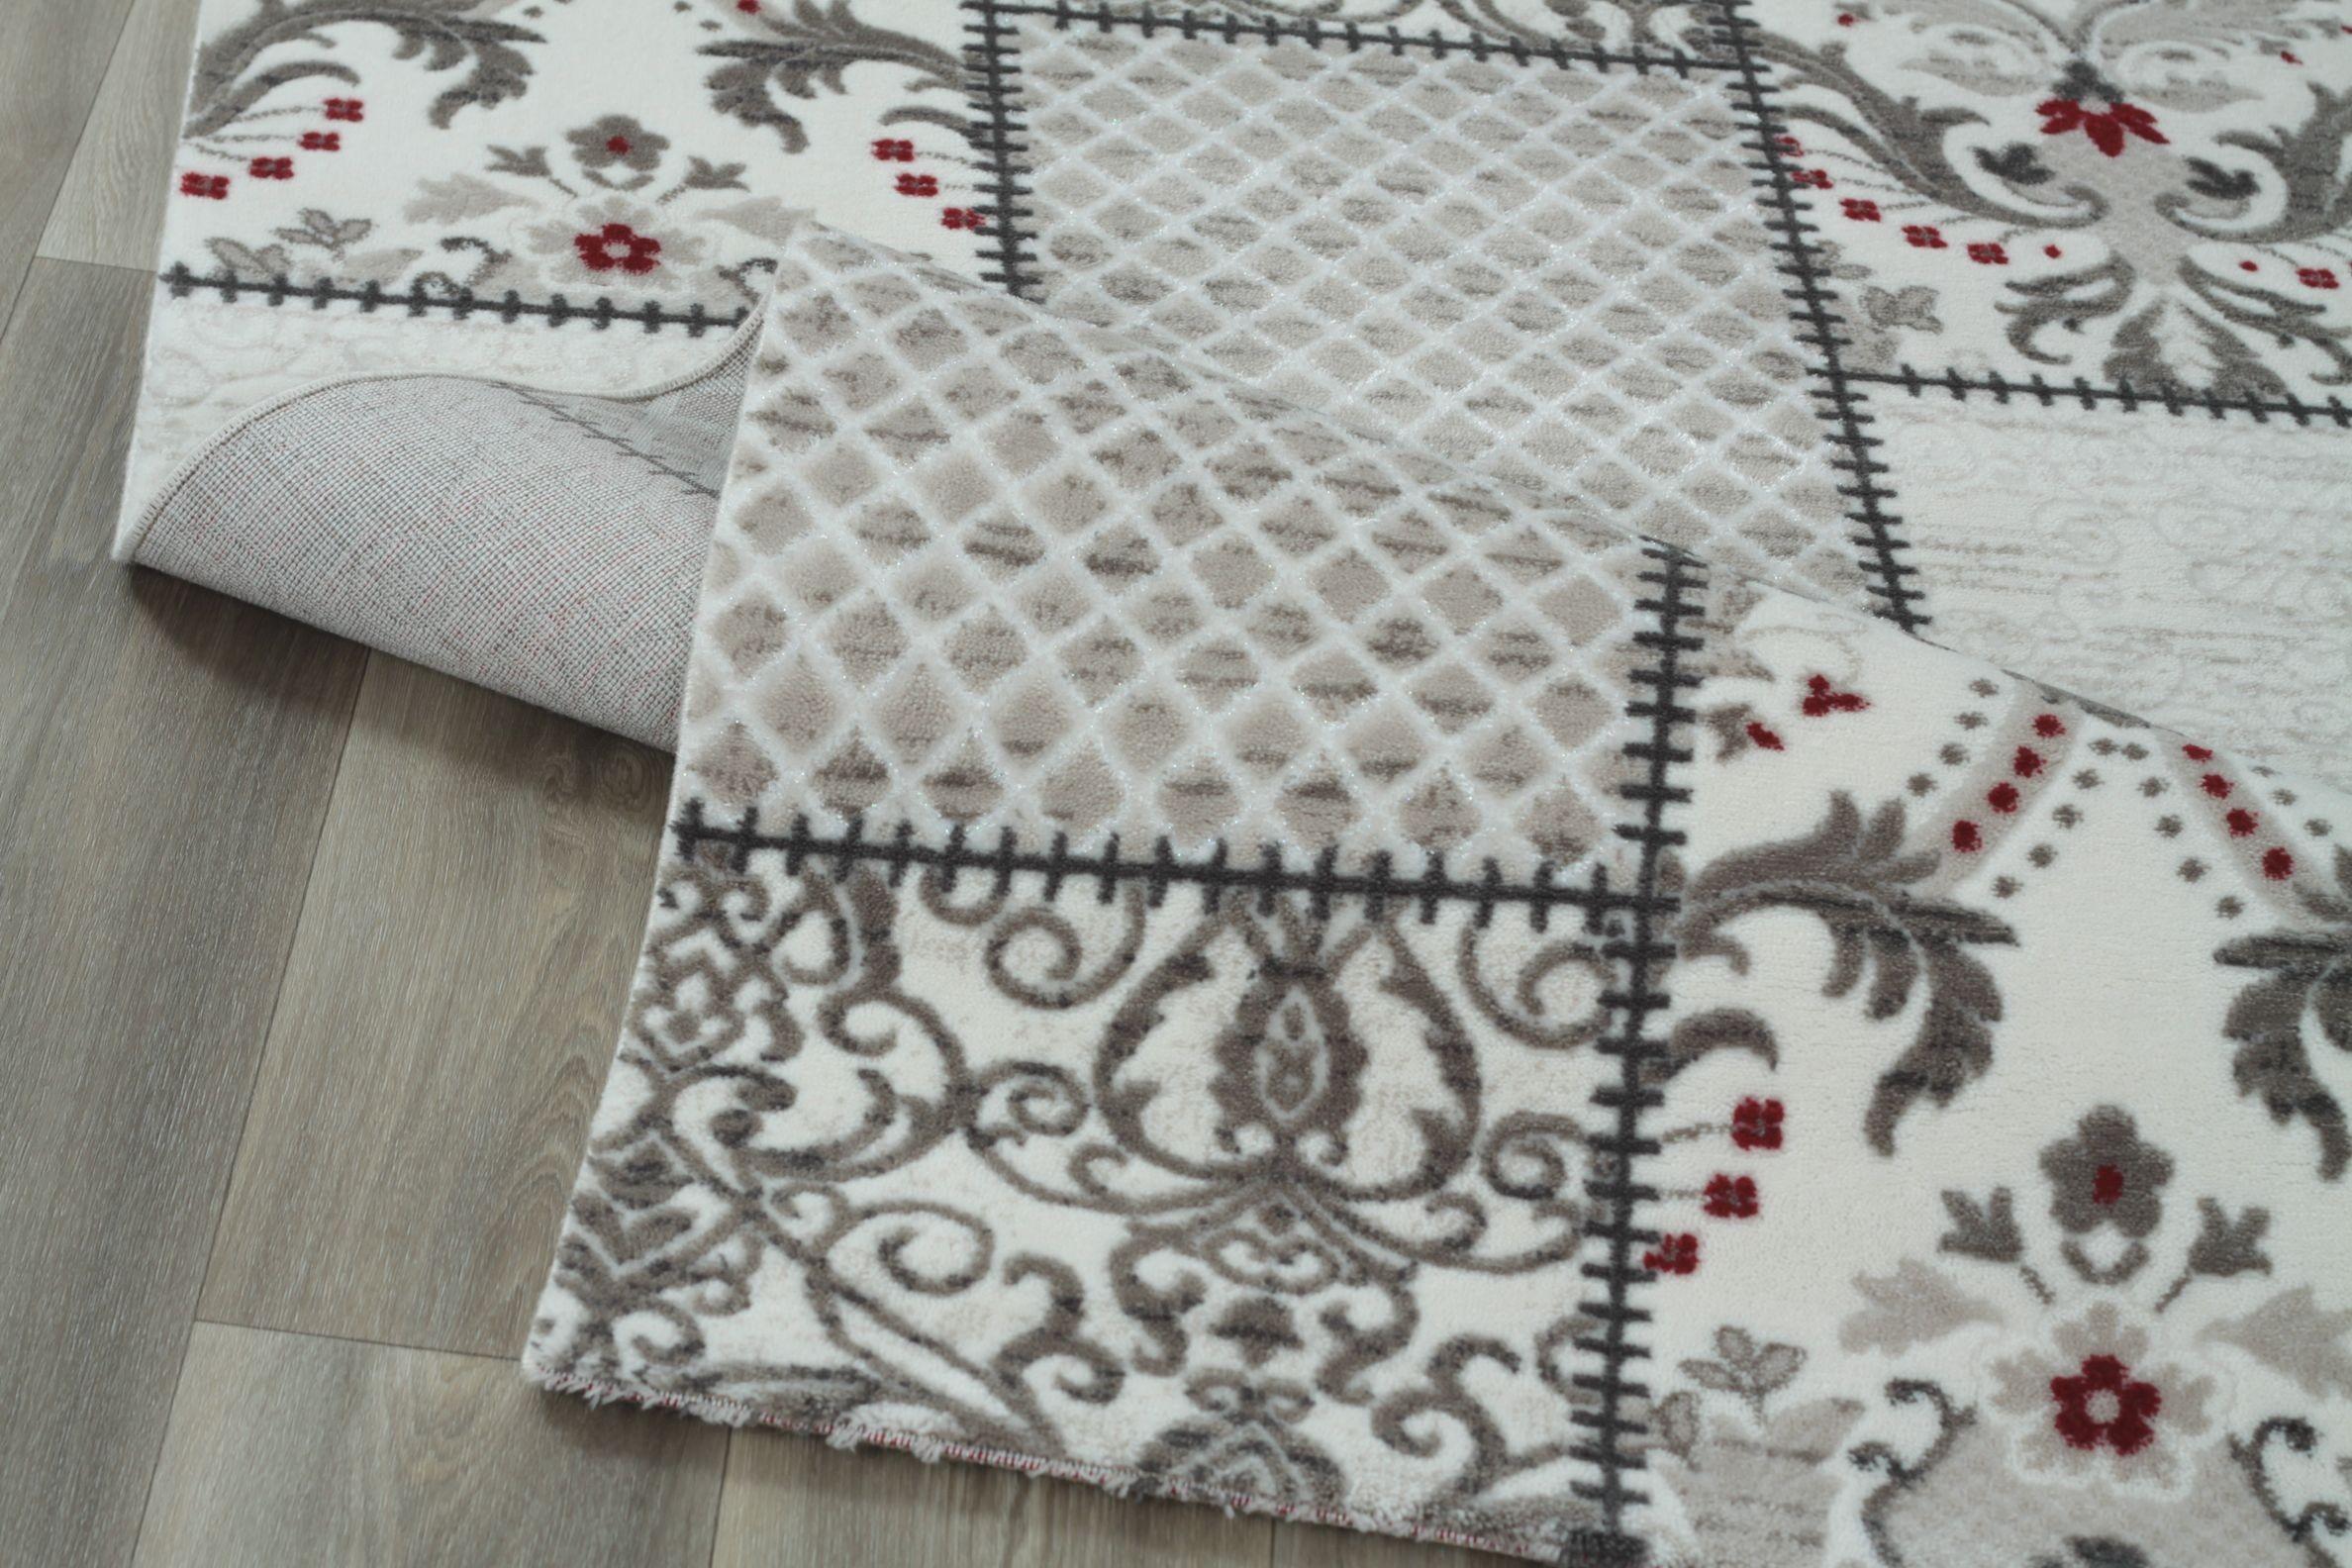 tapis en acrylique baroque contemporain batik 4